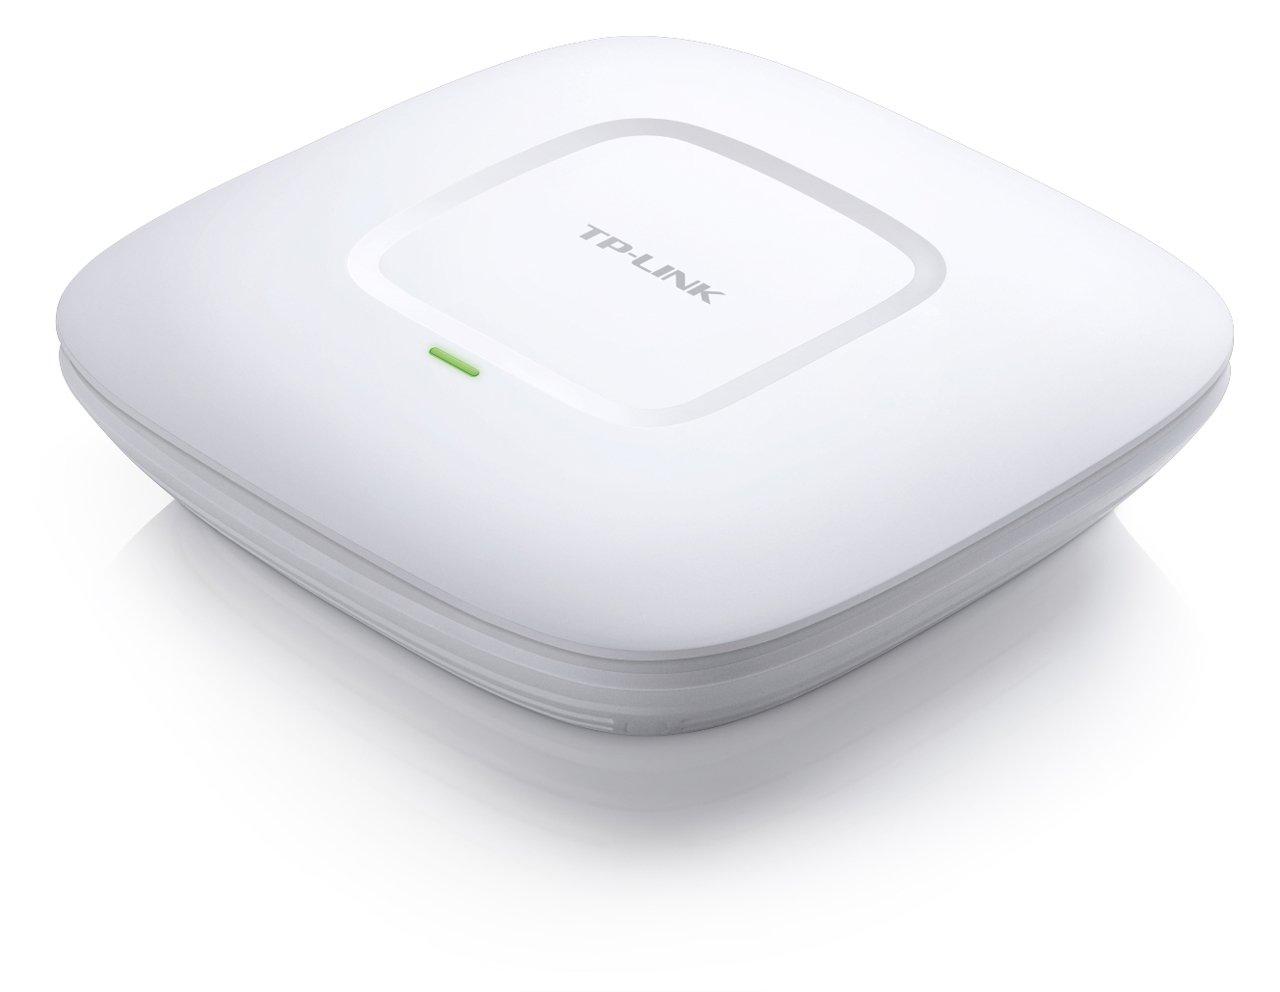 TP-LINK EAP120 WLAN PoE Access Point zur Deckenmontage (300Mbit/s, 1 Gigabit LAN )